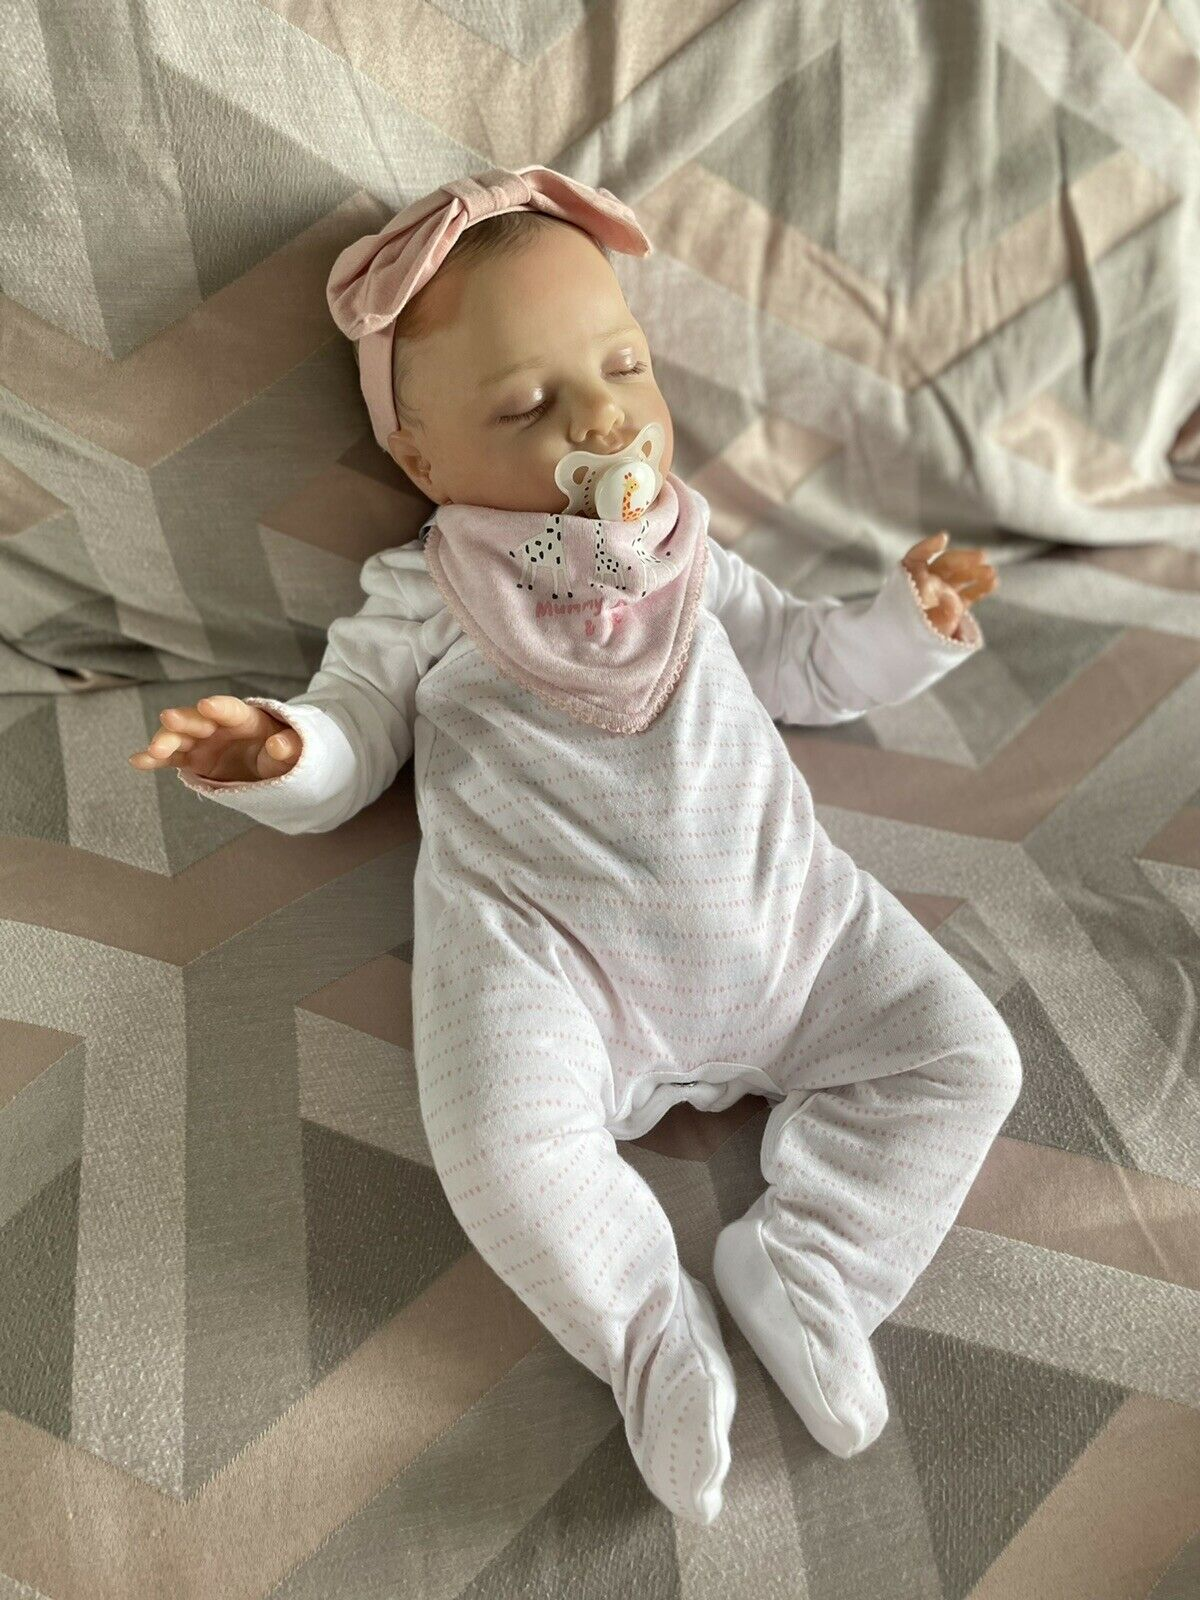 Reborn baby Ruby by Cassie Brace